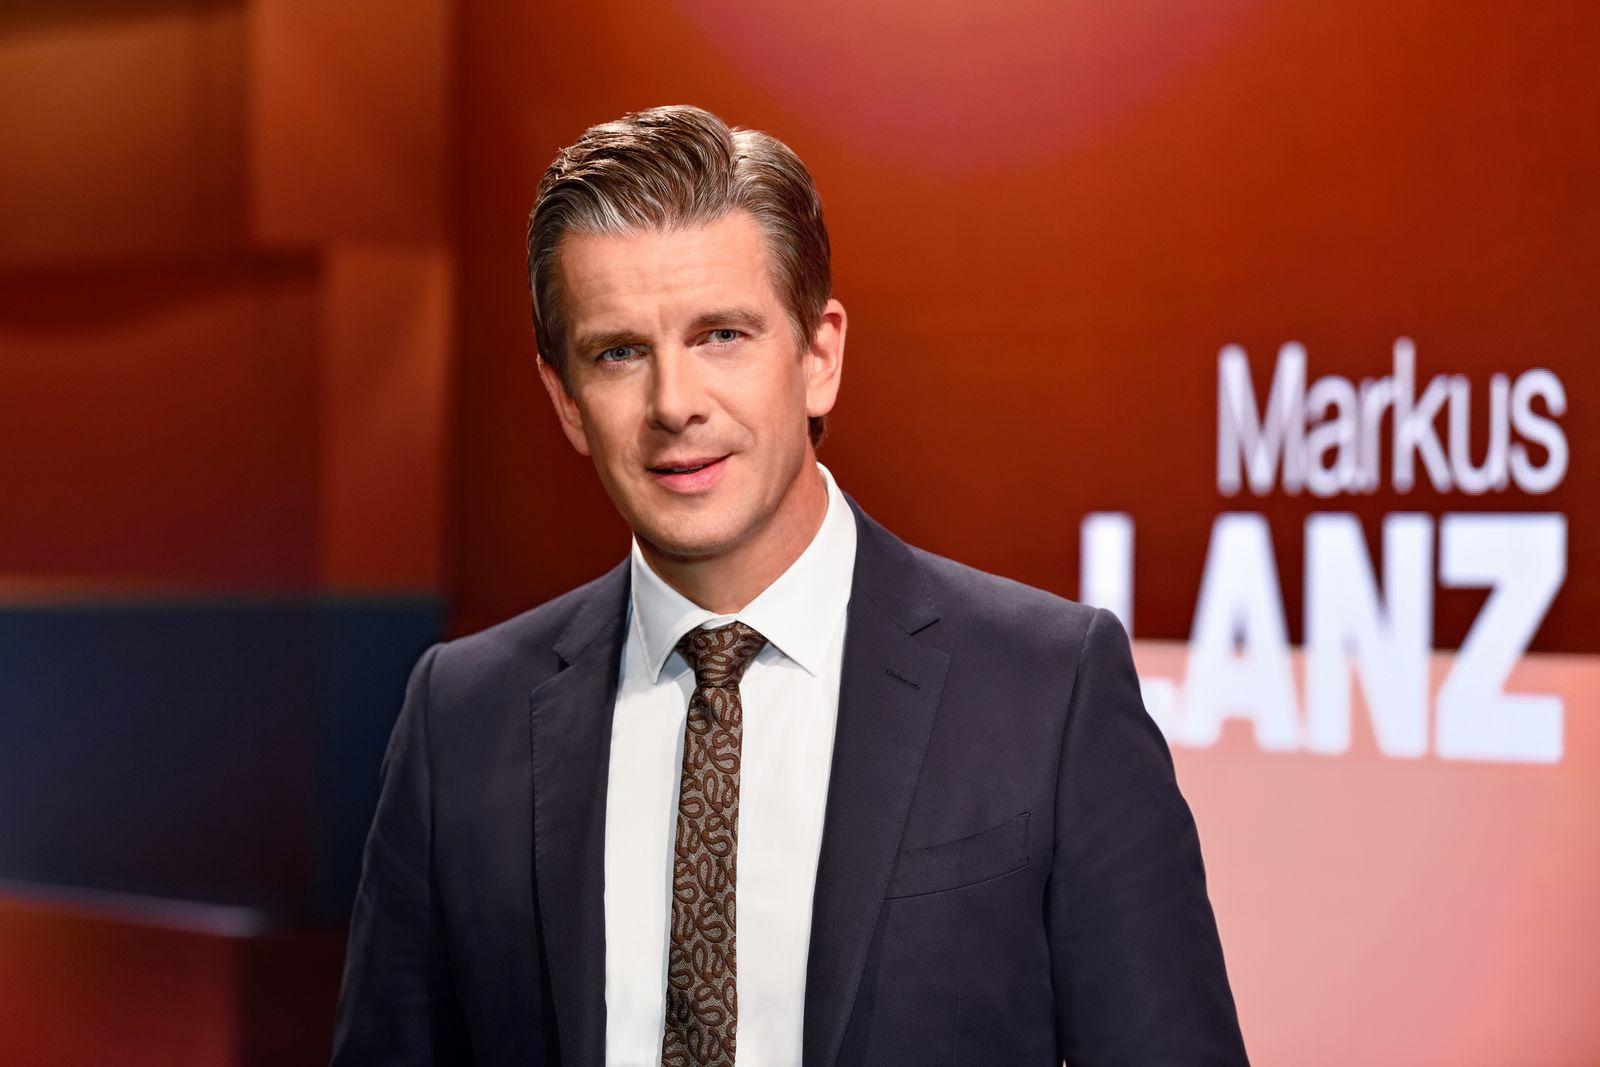 Markus Lanz (2018, 2019, 2020)